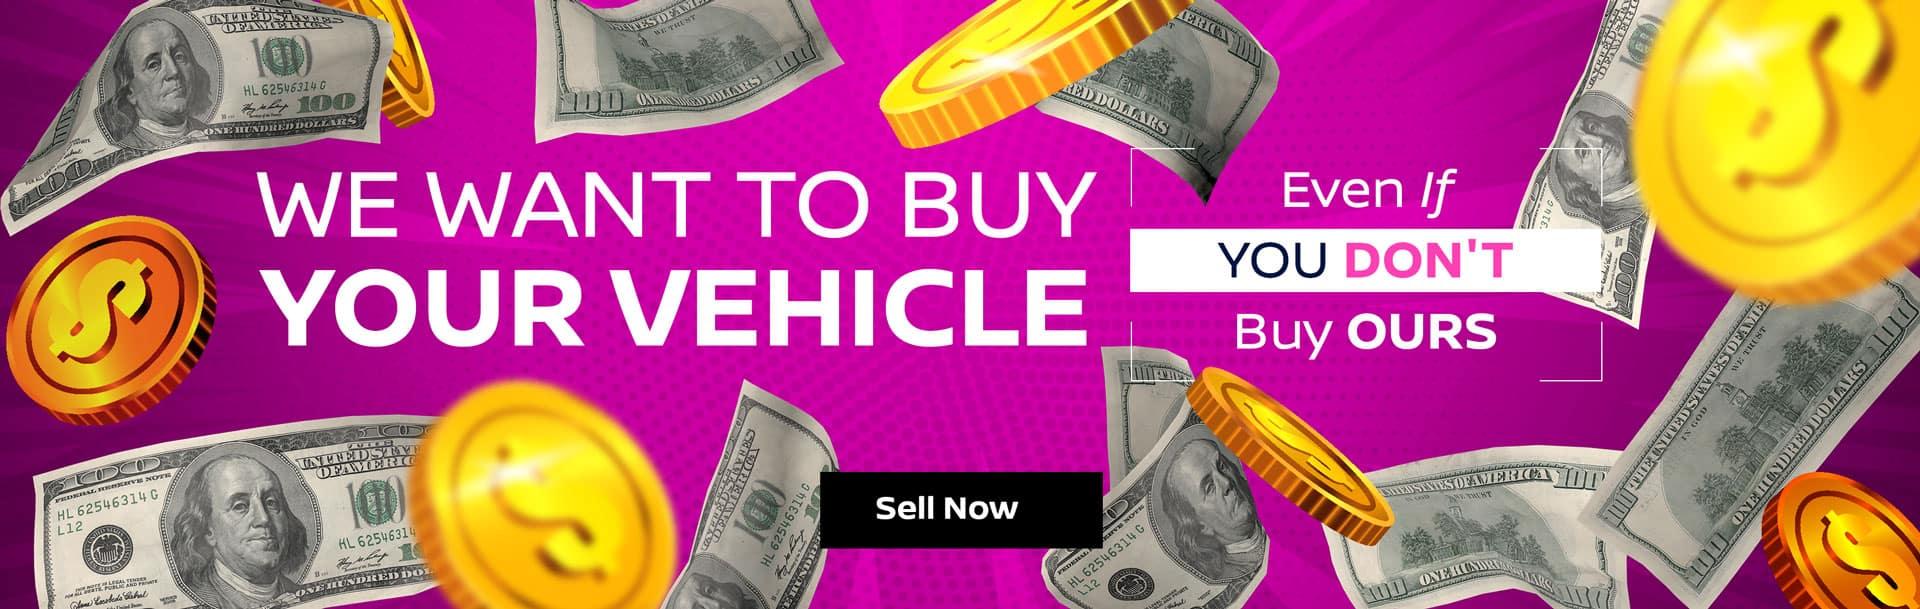 Sell Us Your Vehicle in Spokane, WA